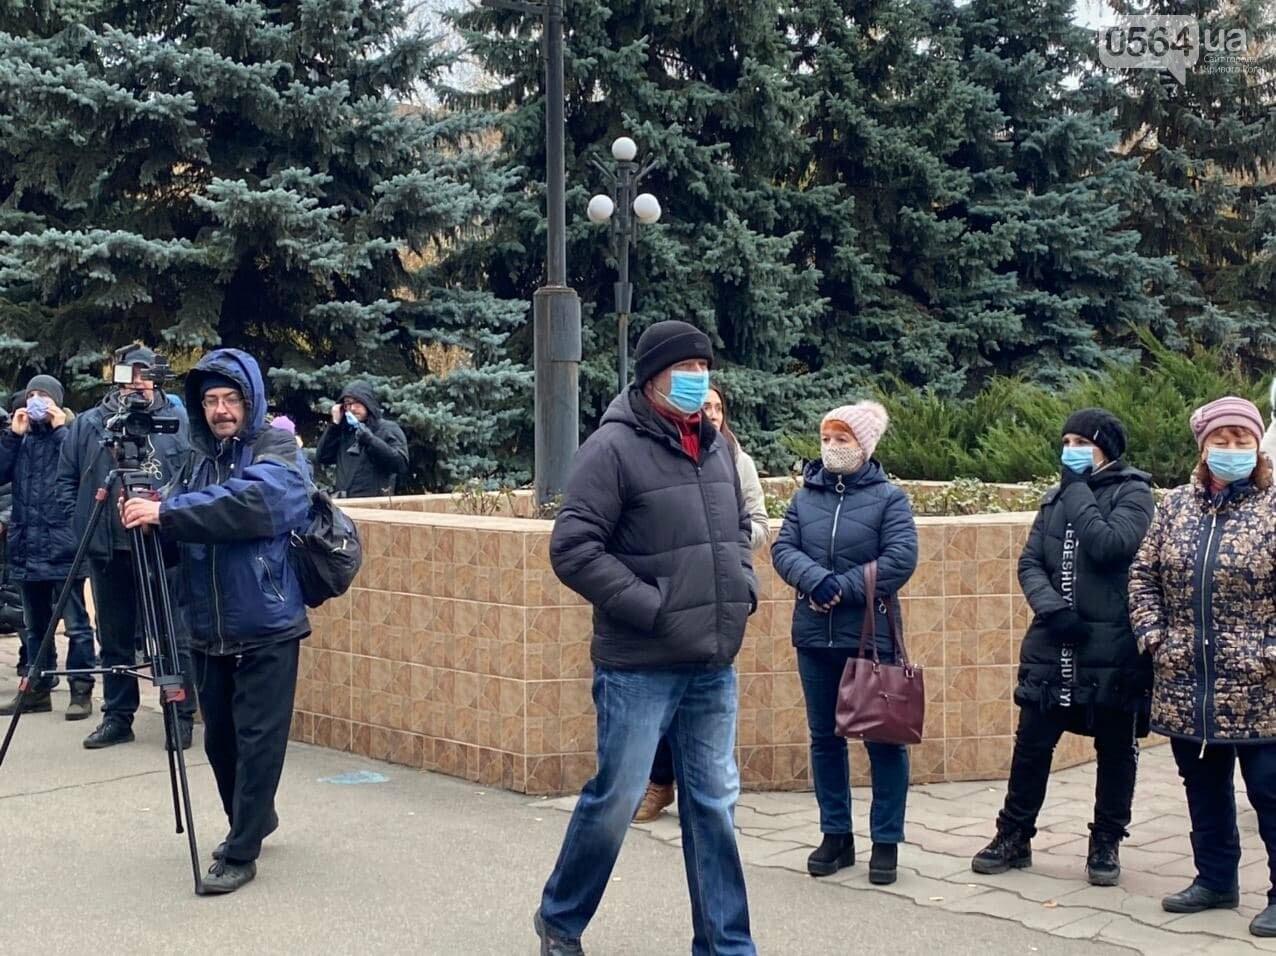 Представители малого бизнеса продолжили протест возле мэрии Кривого Рога, - ФОТО, ВИДЕО, фото-16